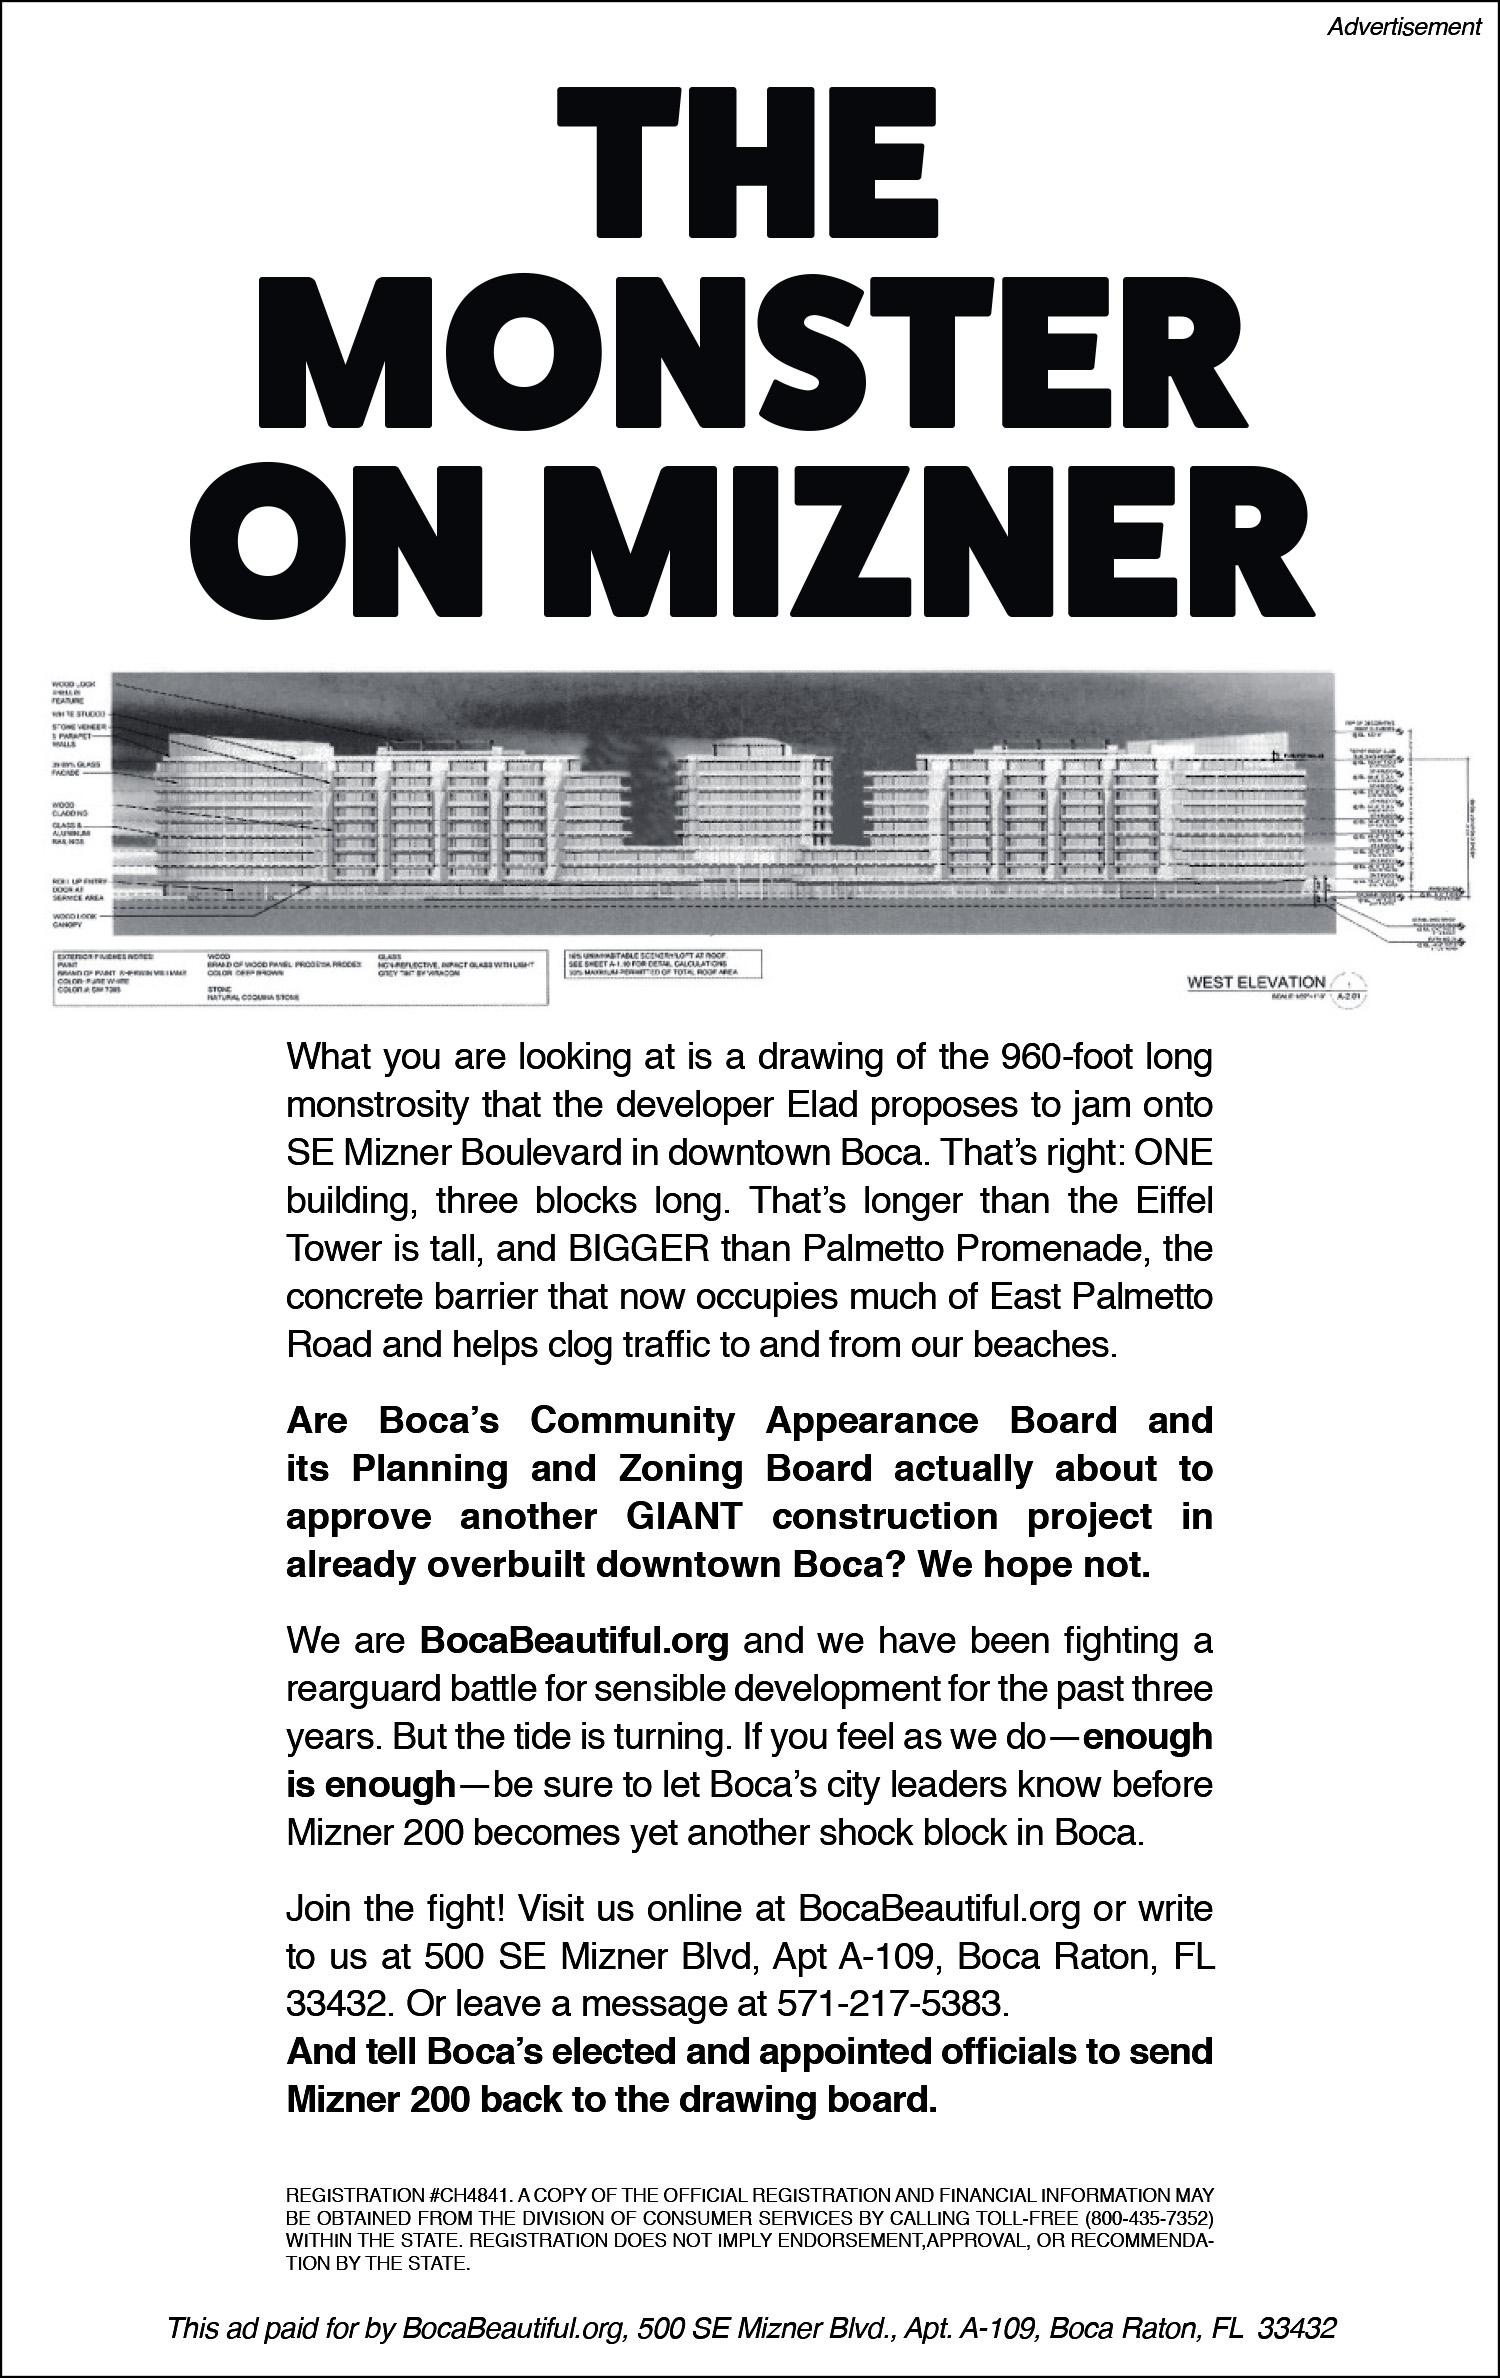 BocaBeautiful-Ad-Monster-Mizner.jpg